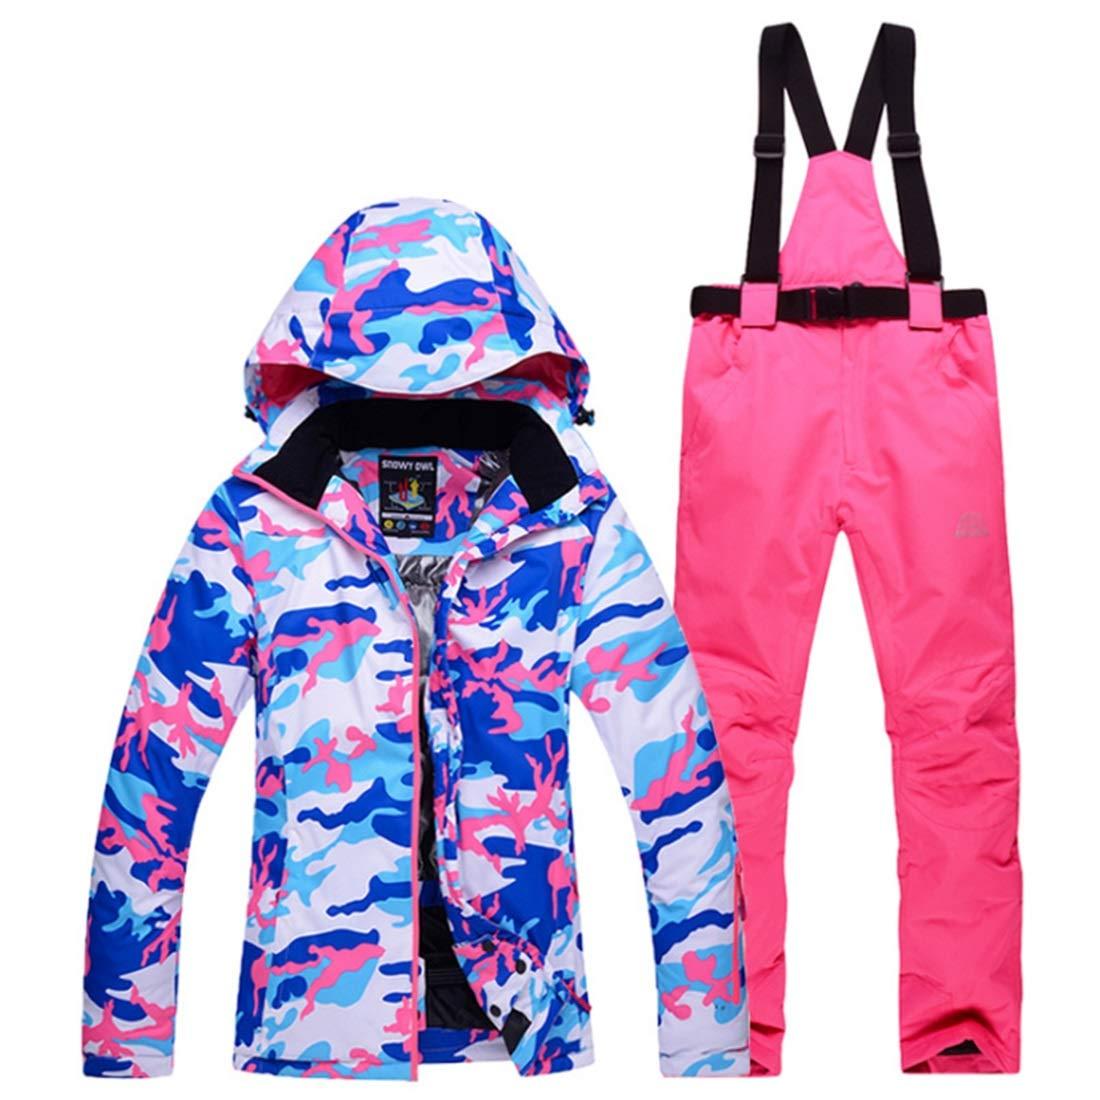 CAFUTY 女性のマウンテンスキージャケット防水防風暖かい冬のレインコート  Small